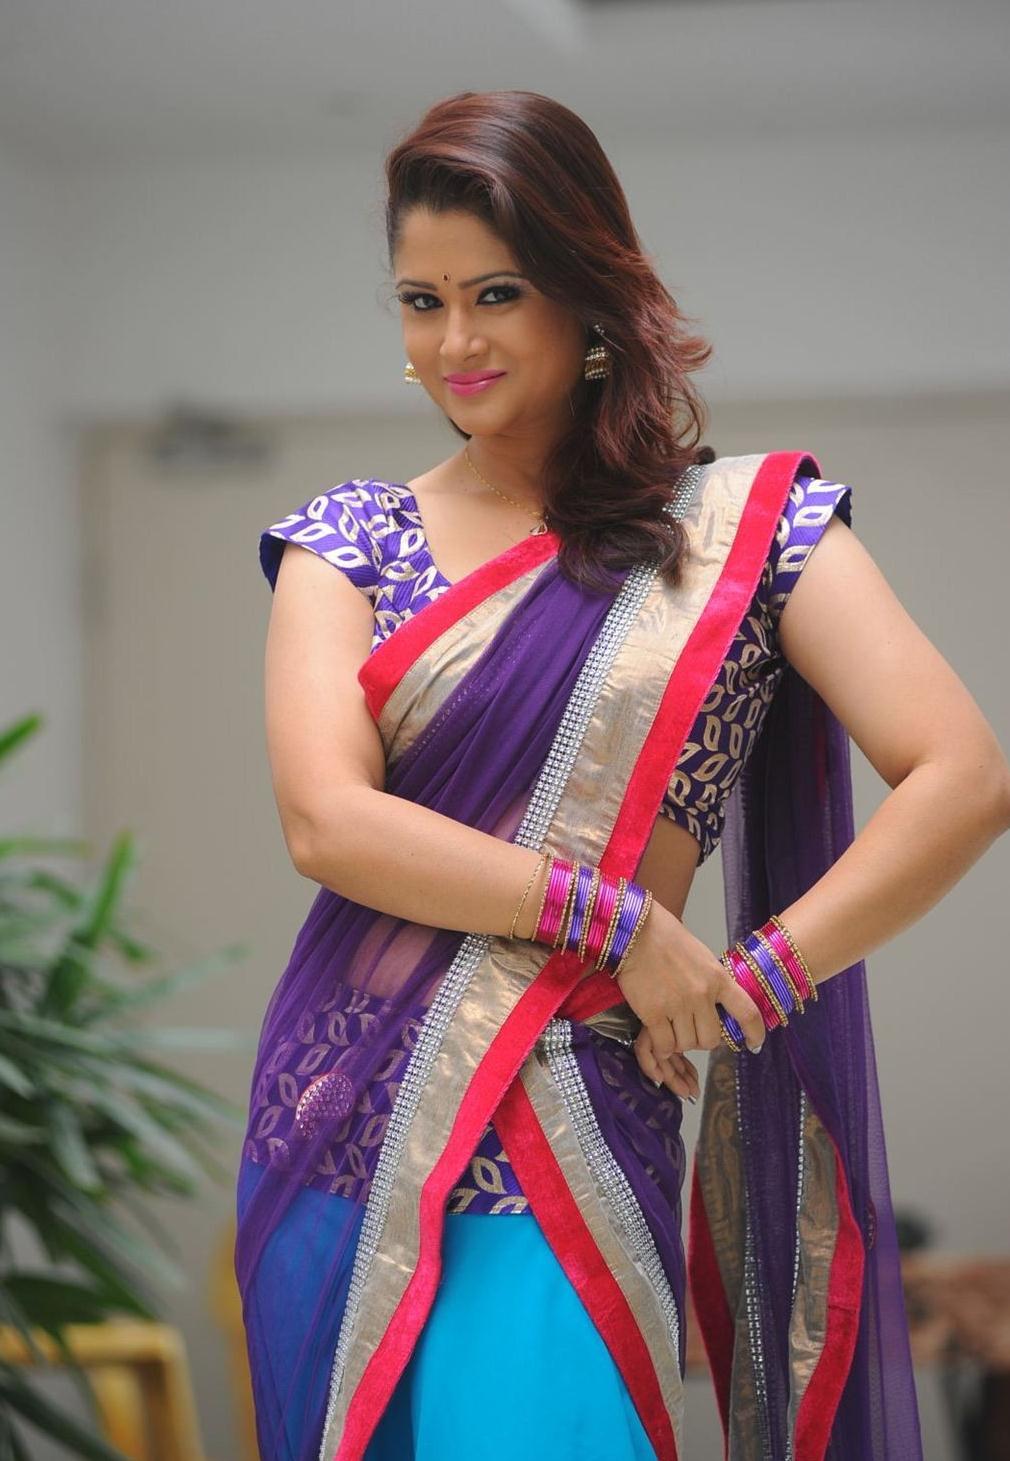 TV-Anchor-Shilpa-Chakravarthy-Stills